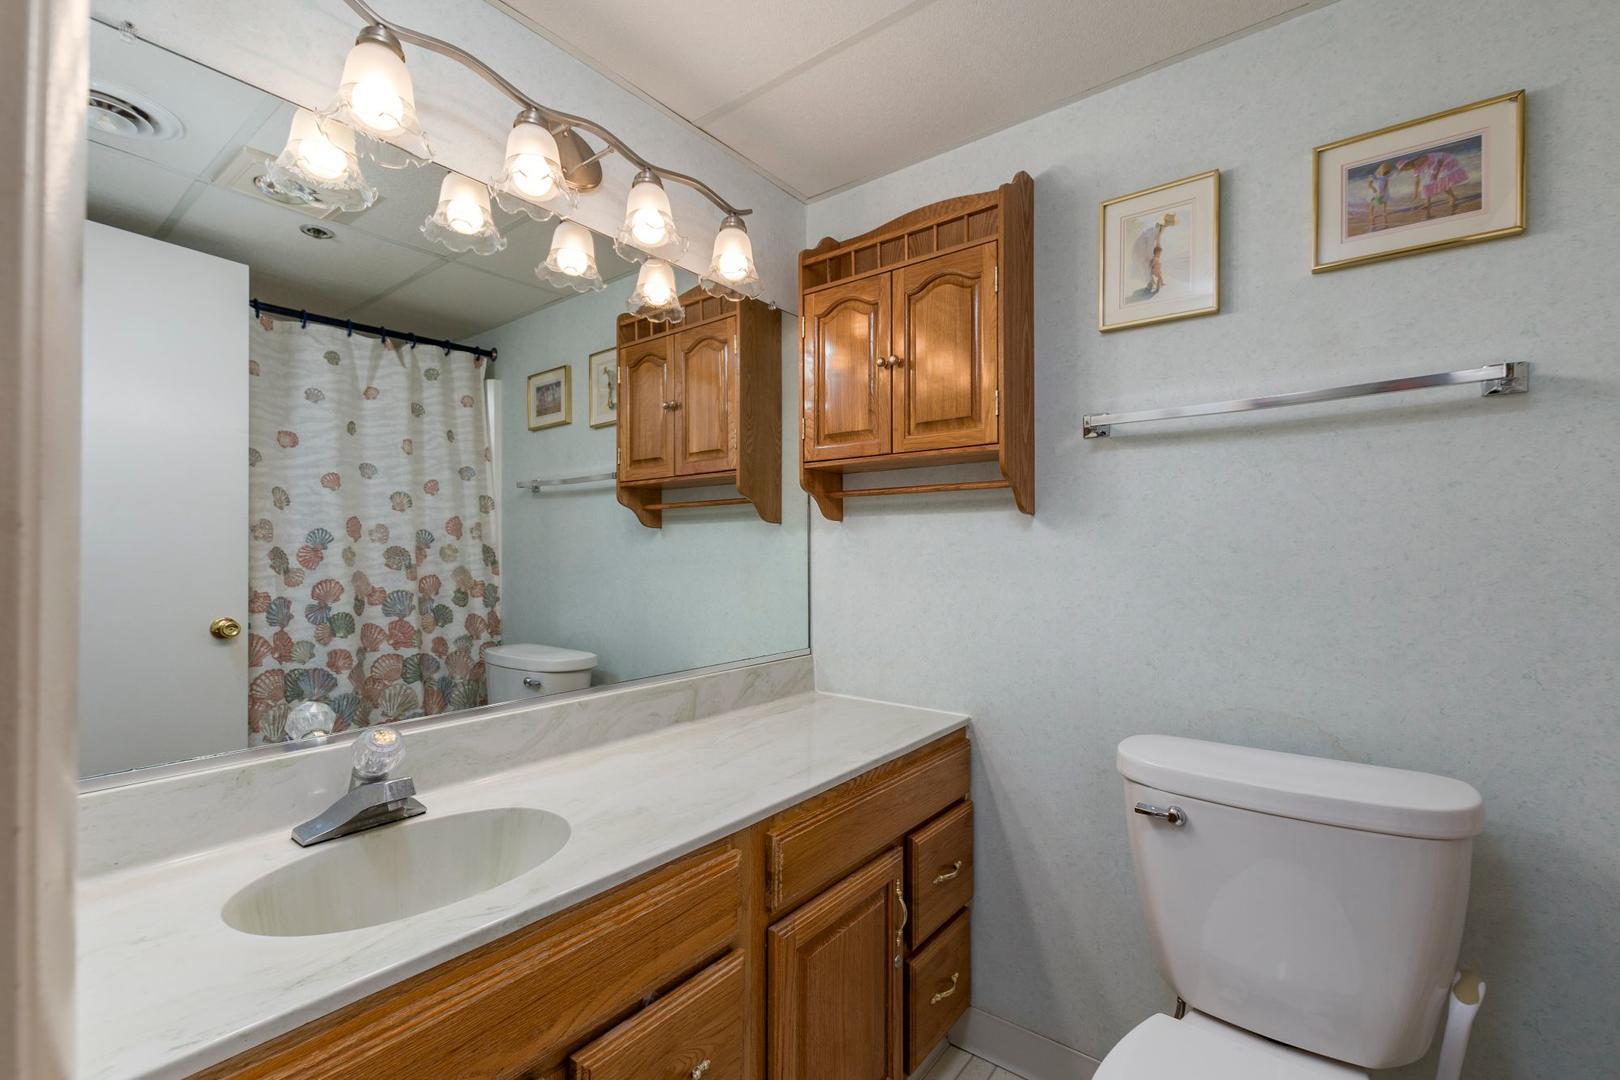 Summer Beach 605 - Bathroom 2